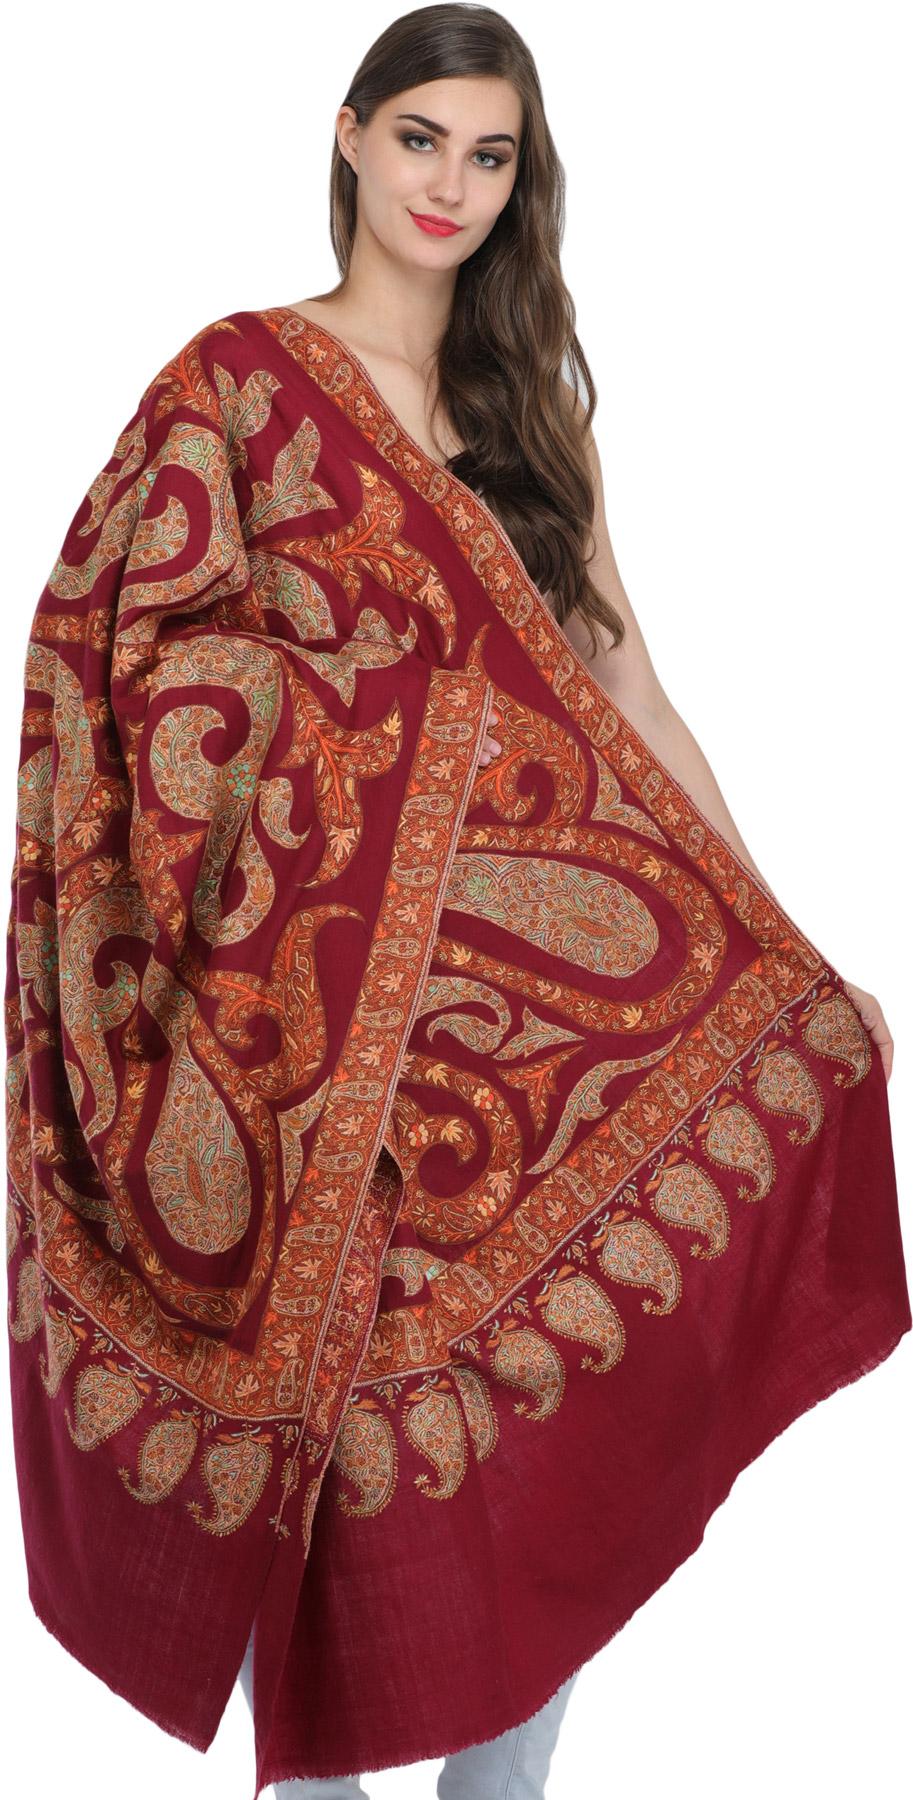 Pictures of kashmiri shawls Dalhousie Tourism Dalhousie Tourist Places Dalhousie